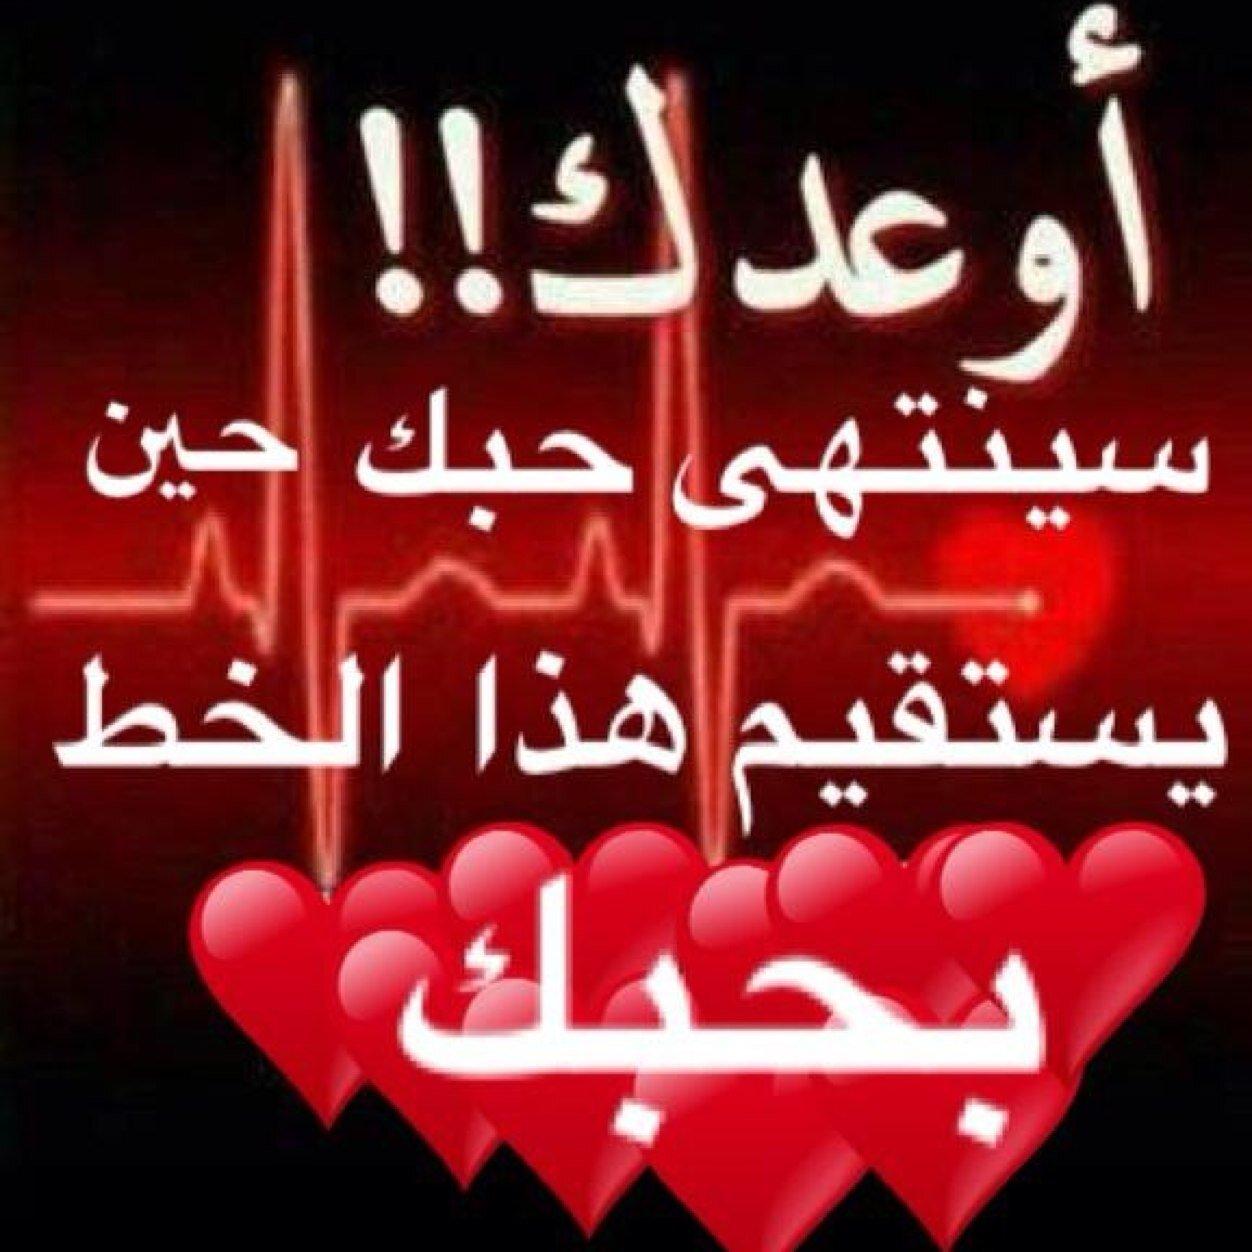 Noor On Twitter Ghadabdelrazik ربنا يخليكم لبعض ويسعدكم امين